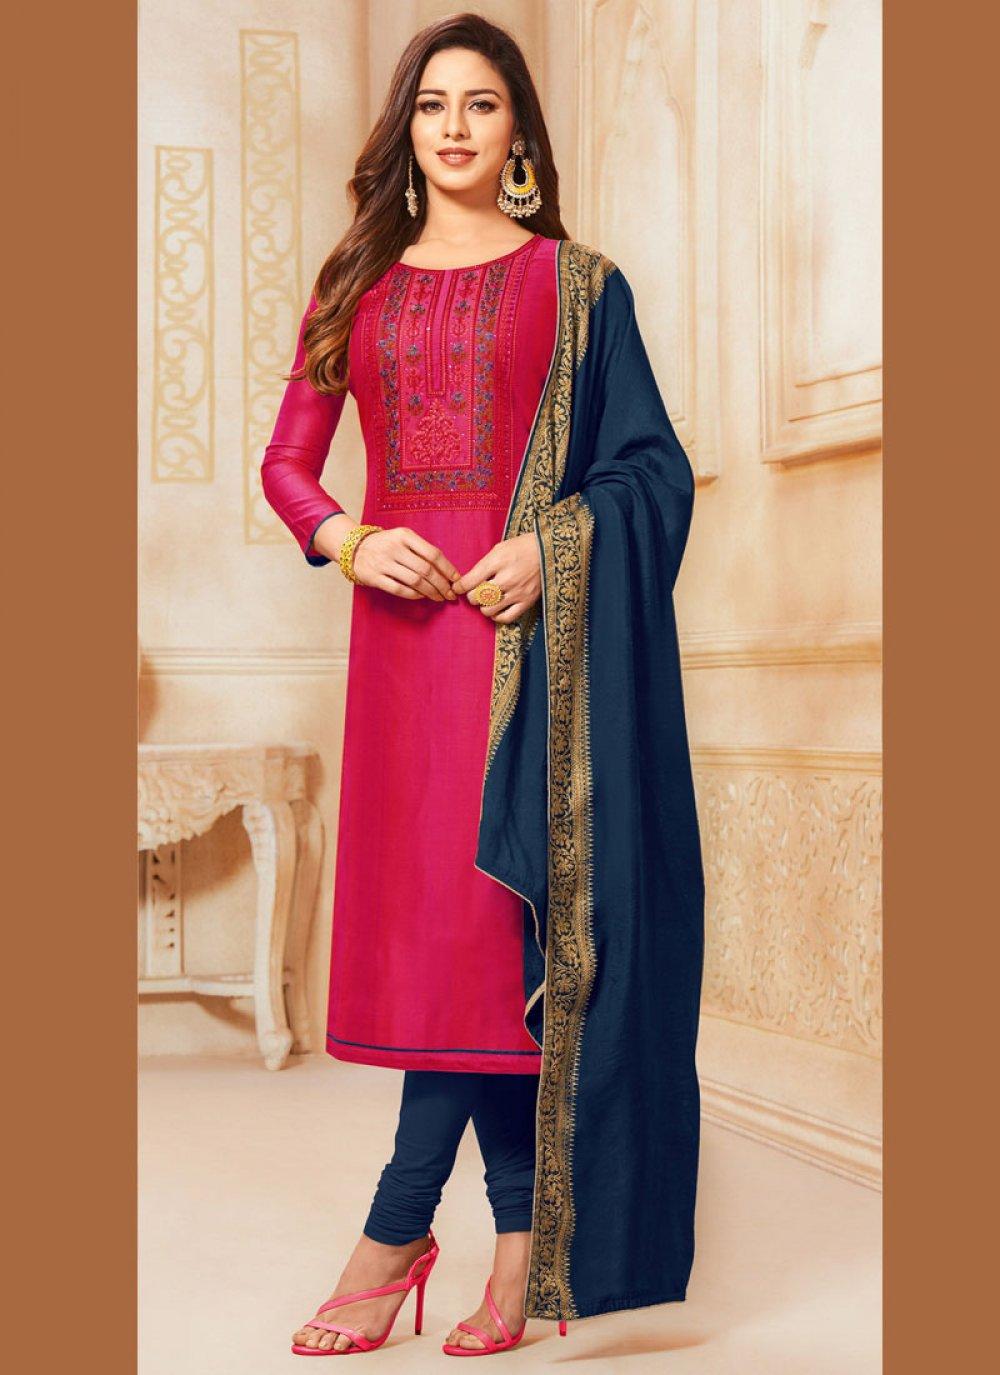 Resham Cotton Trendy Churidar Suit in Hot Pink